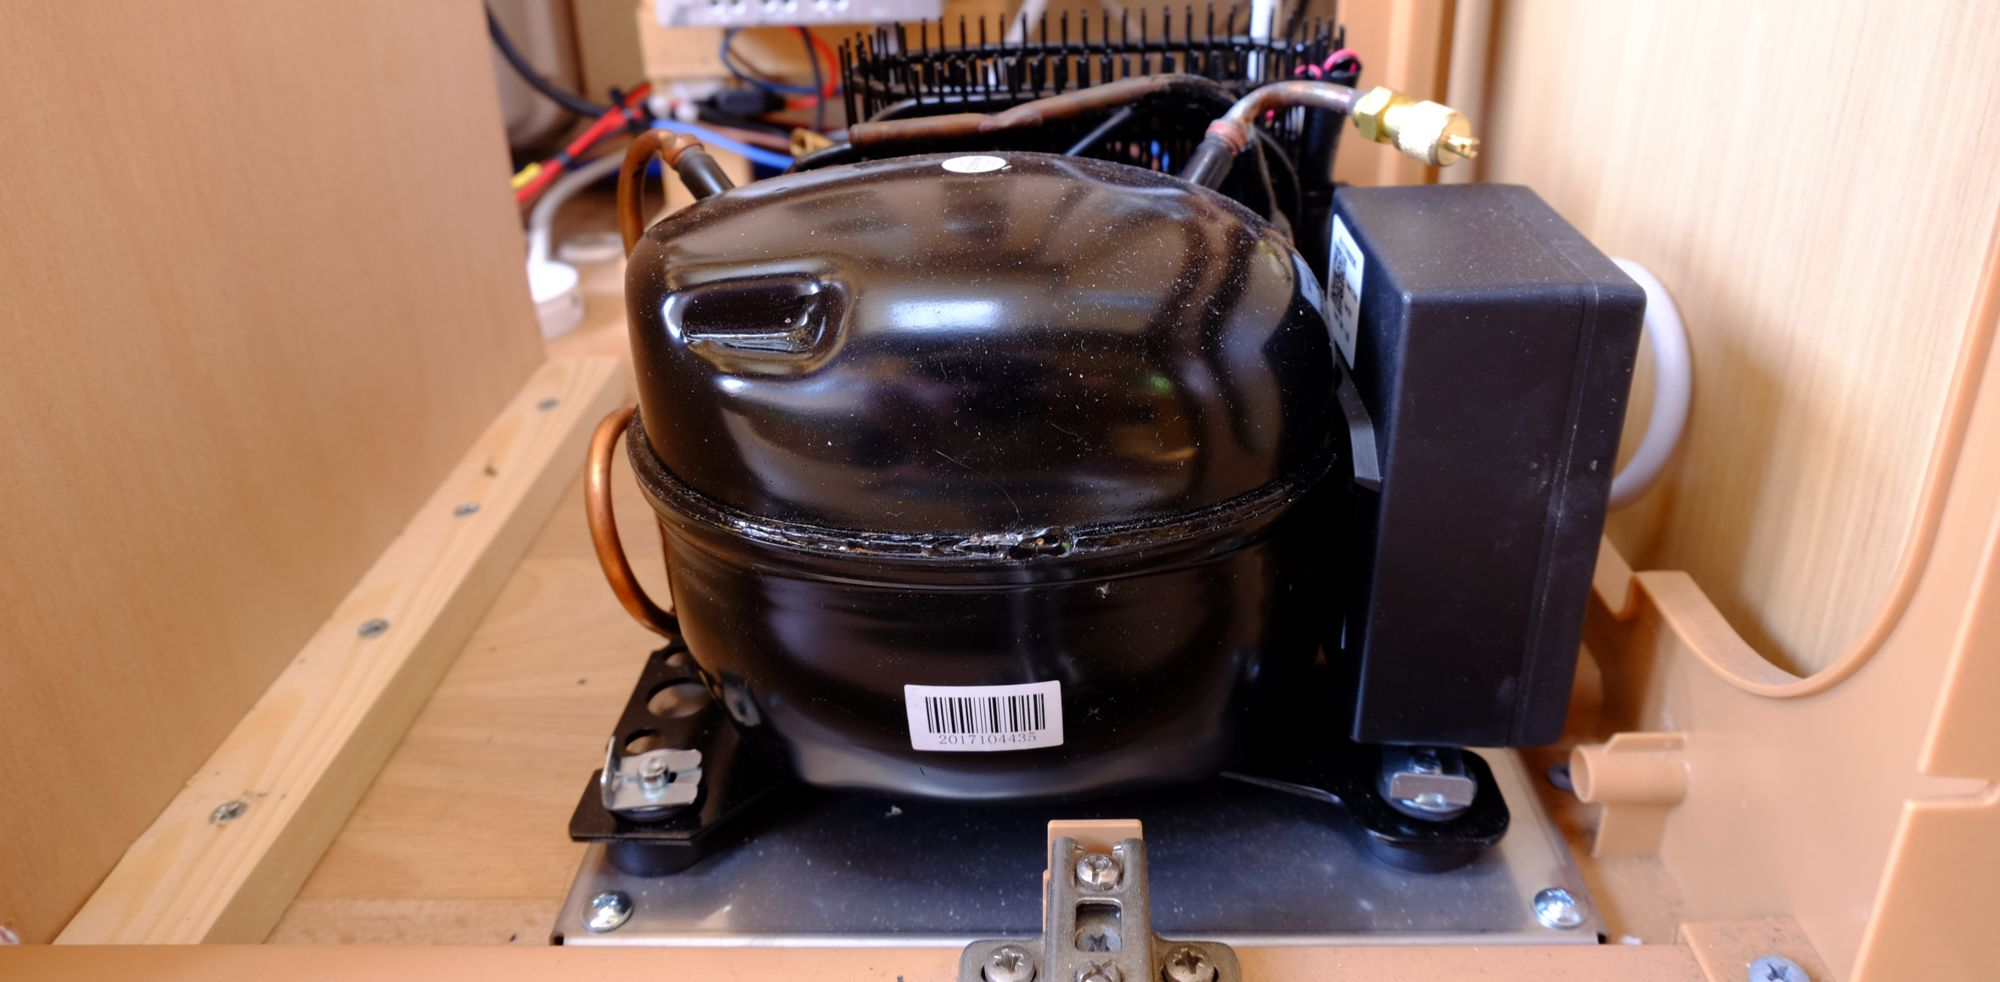 Dometic CU55 Compressor mounted under caravan bed/seating.